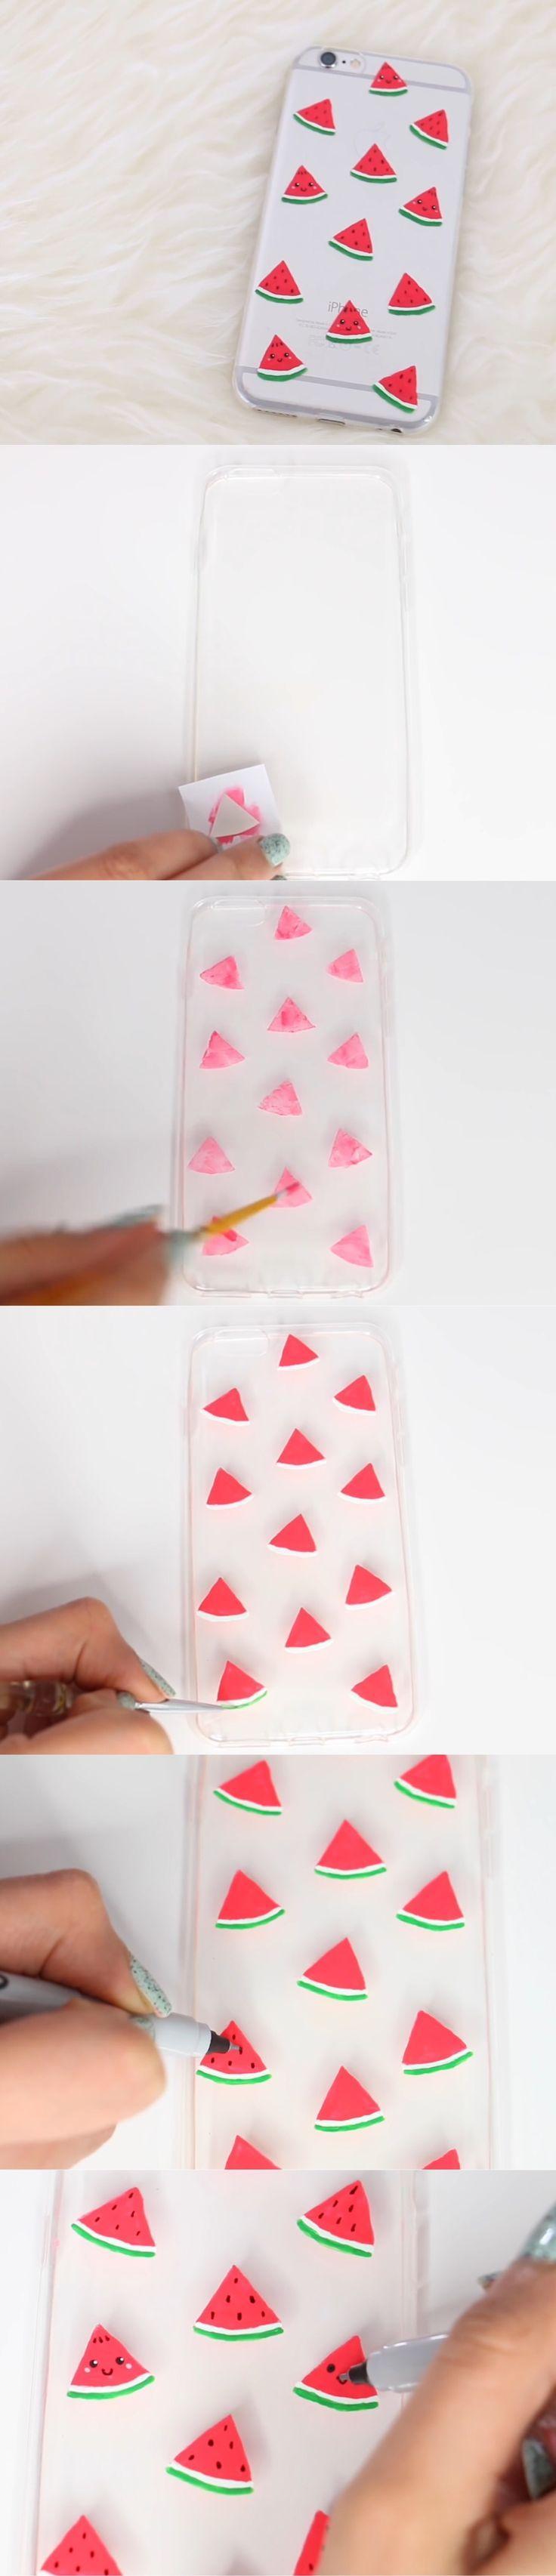 Nim C's watermelon phone case DIY tutorial. So cute!!!!